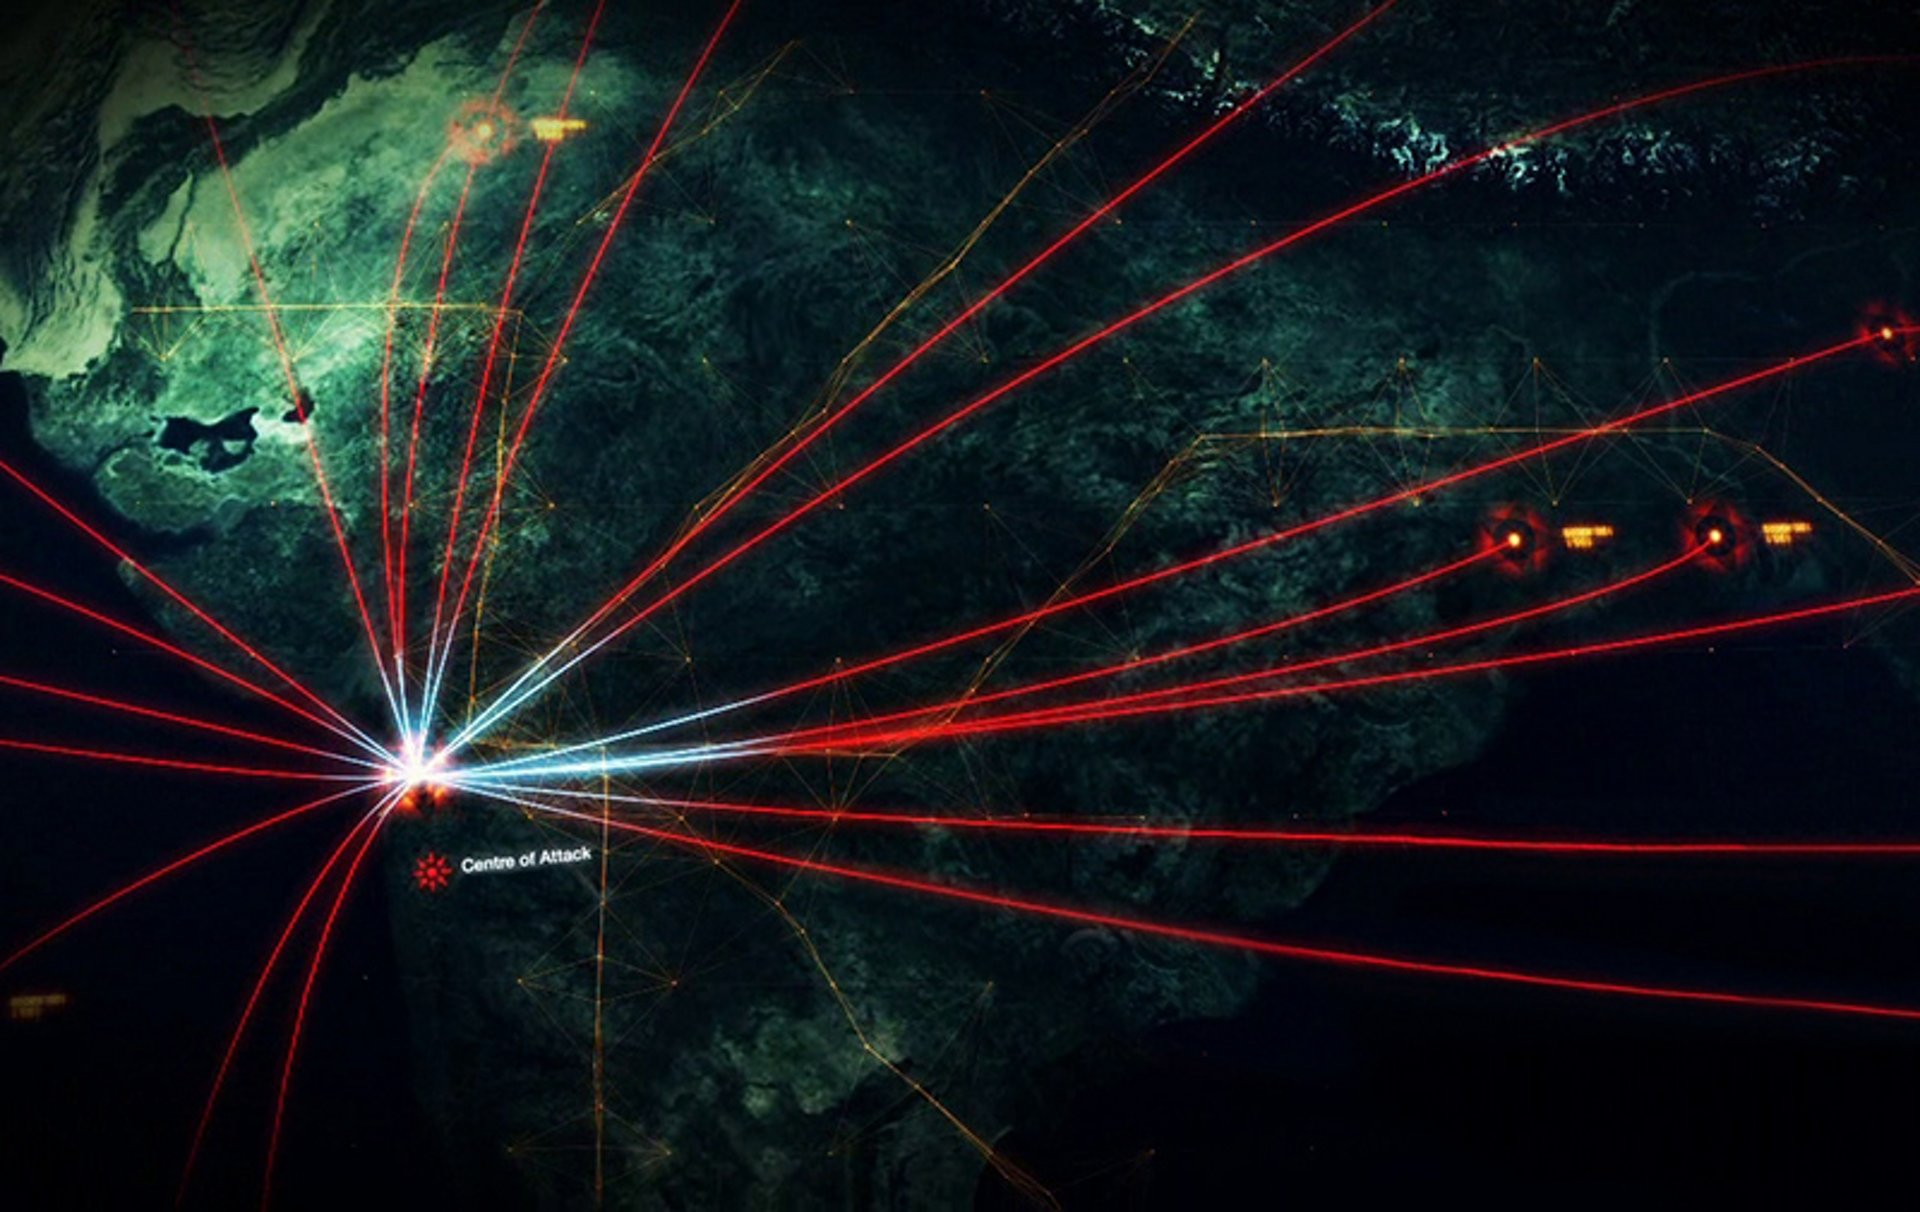 Cyber-Attack illustration